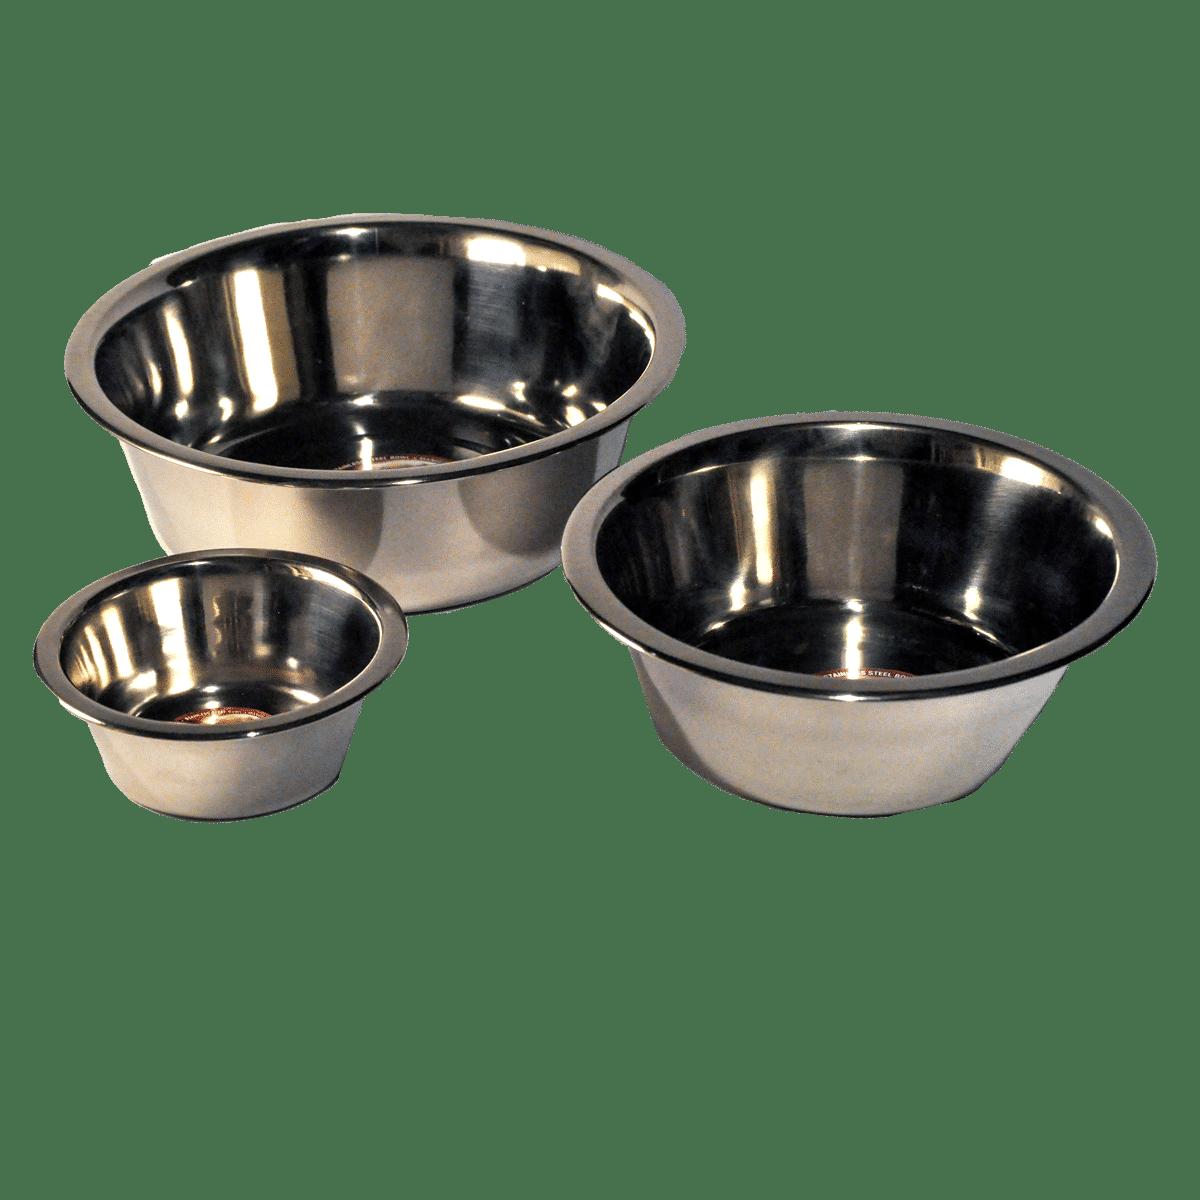 Rostfria hundskålar i olika storlekar